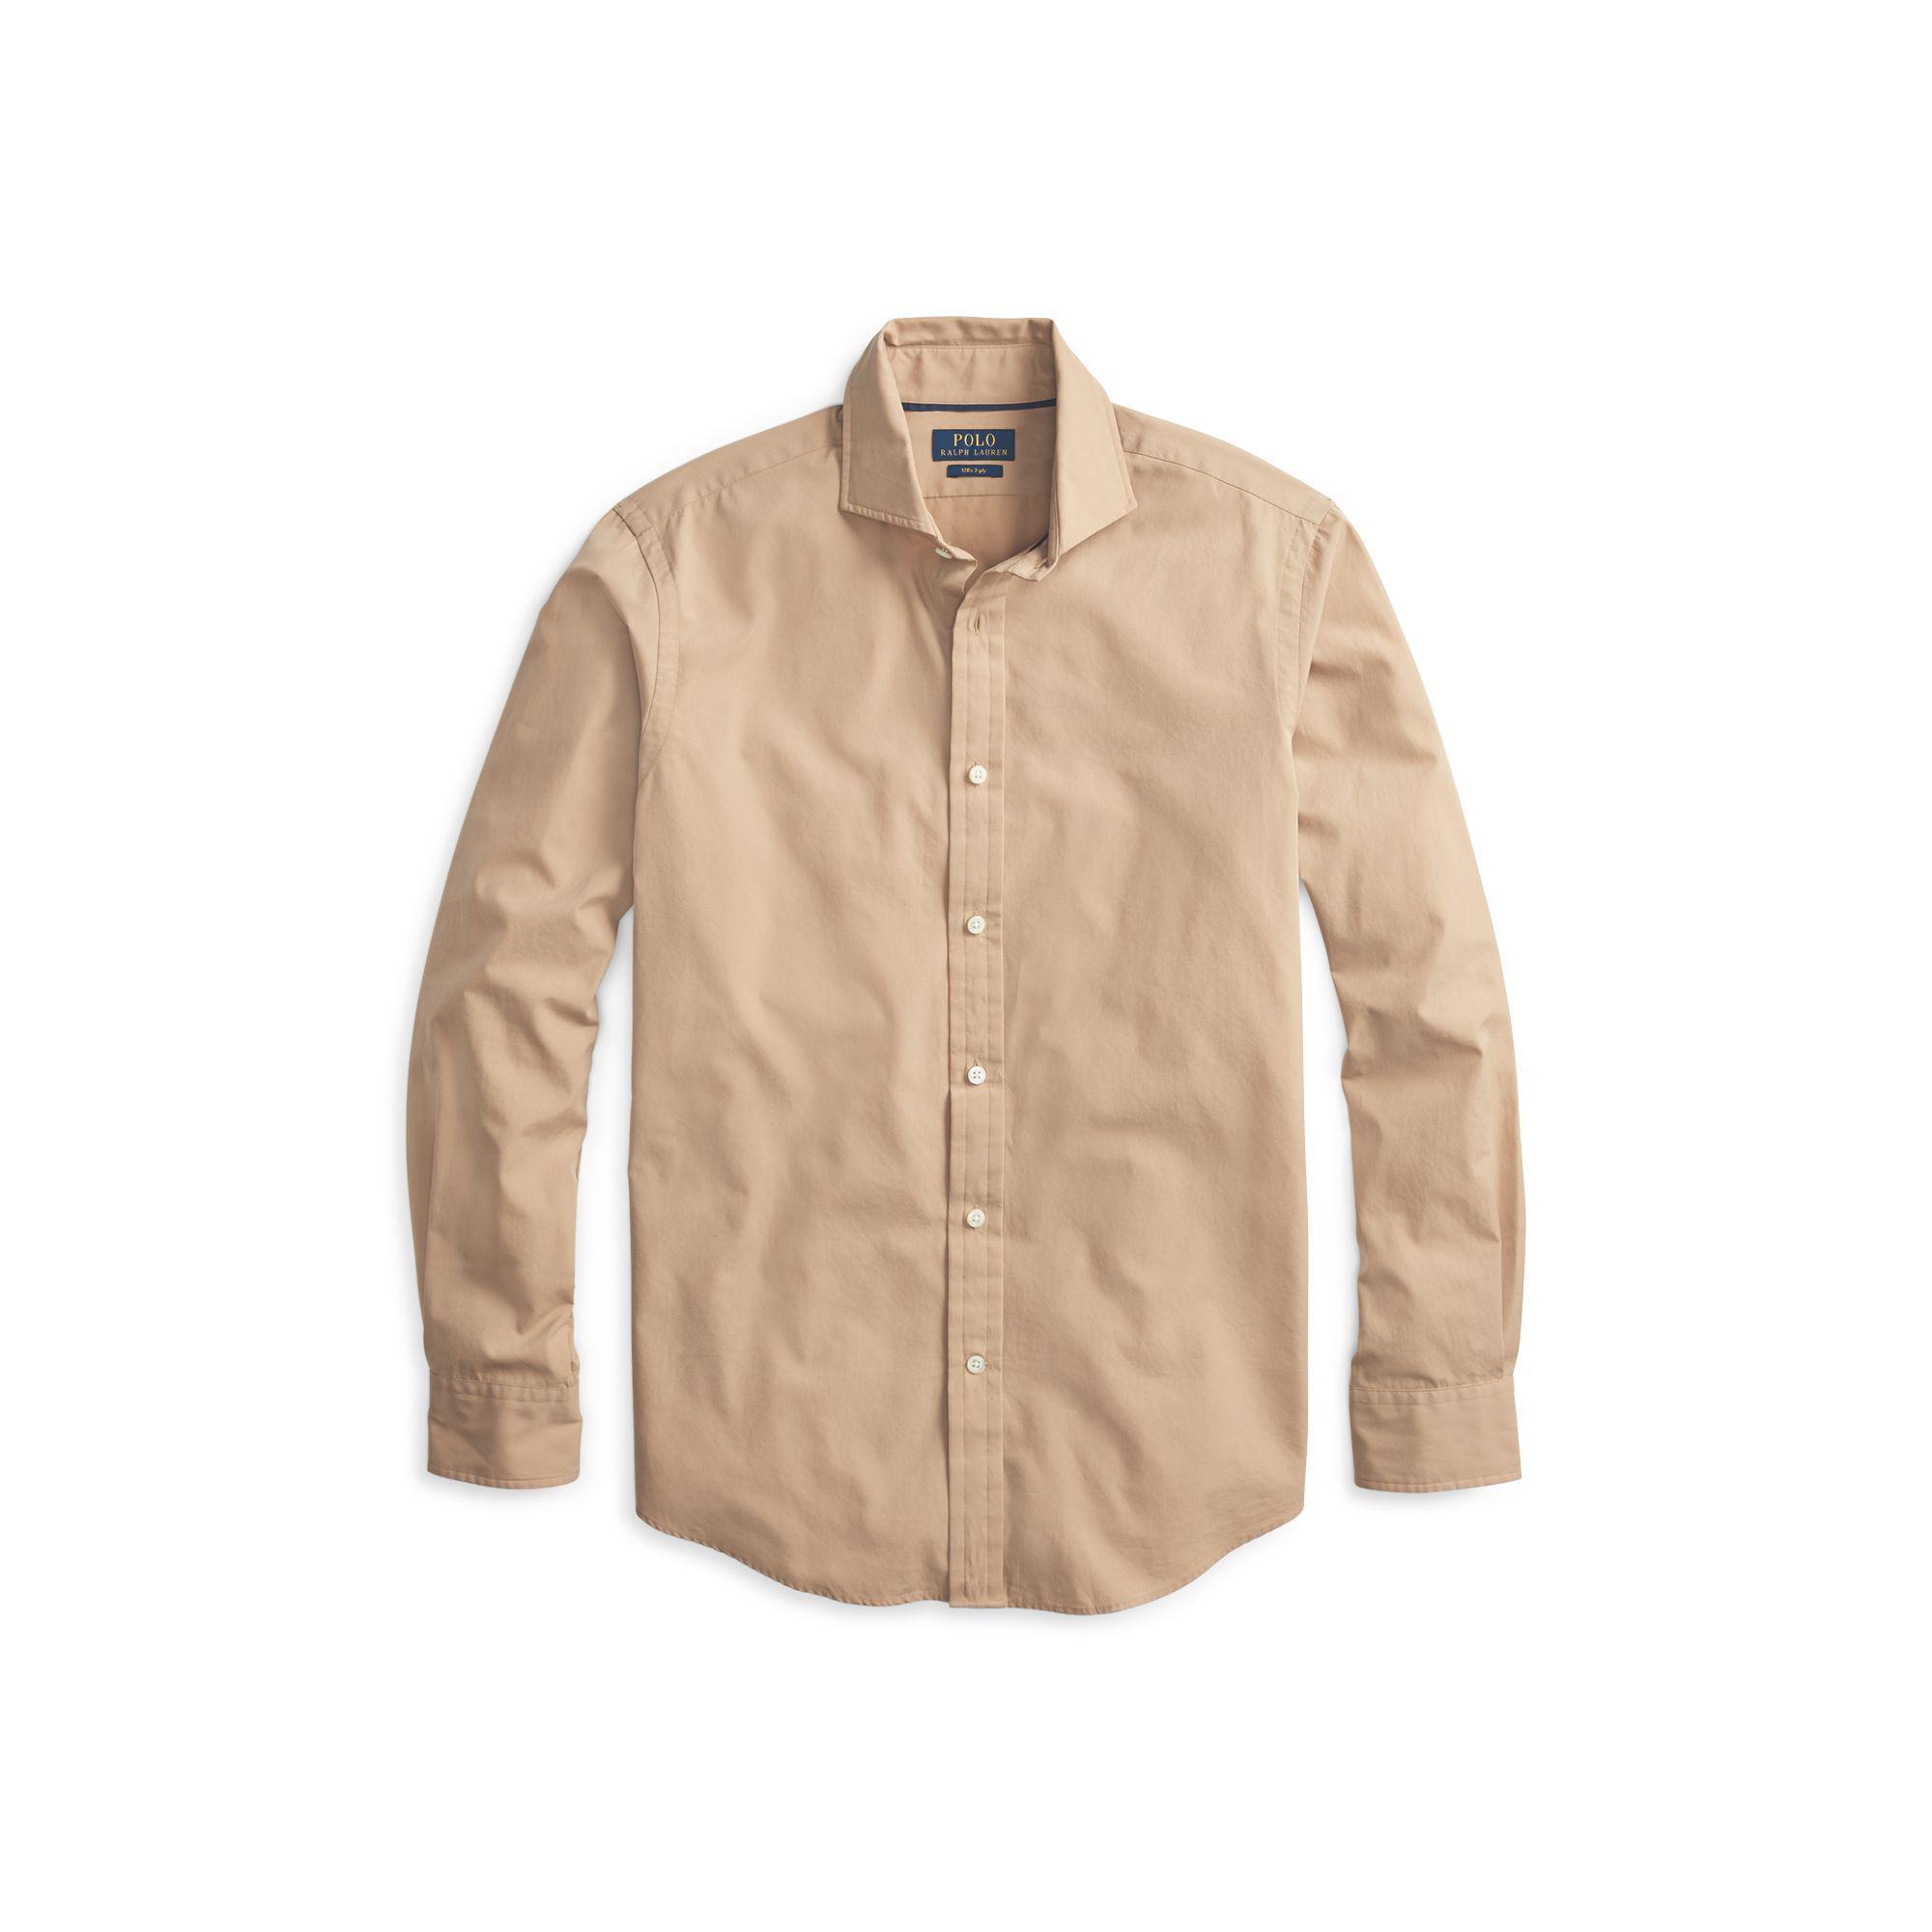 6918f4af696 Polo Ralph Lauren - Natural Classic Fit Poplin Shirt for Men - Lyst. View  fullscreen